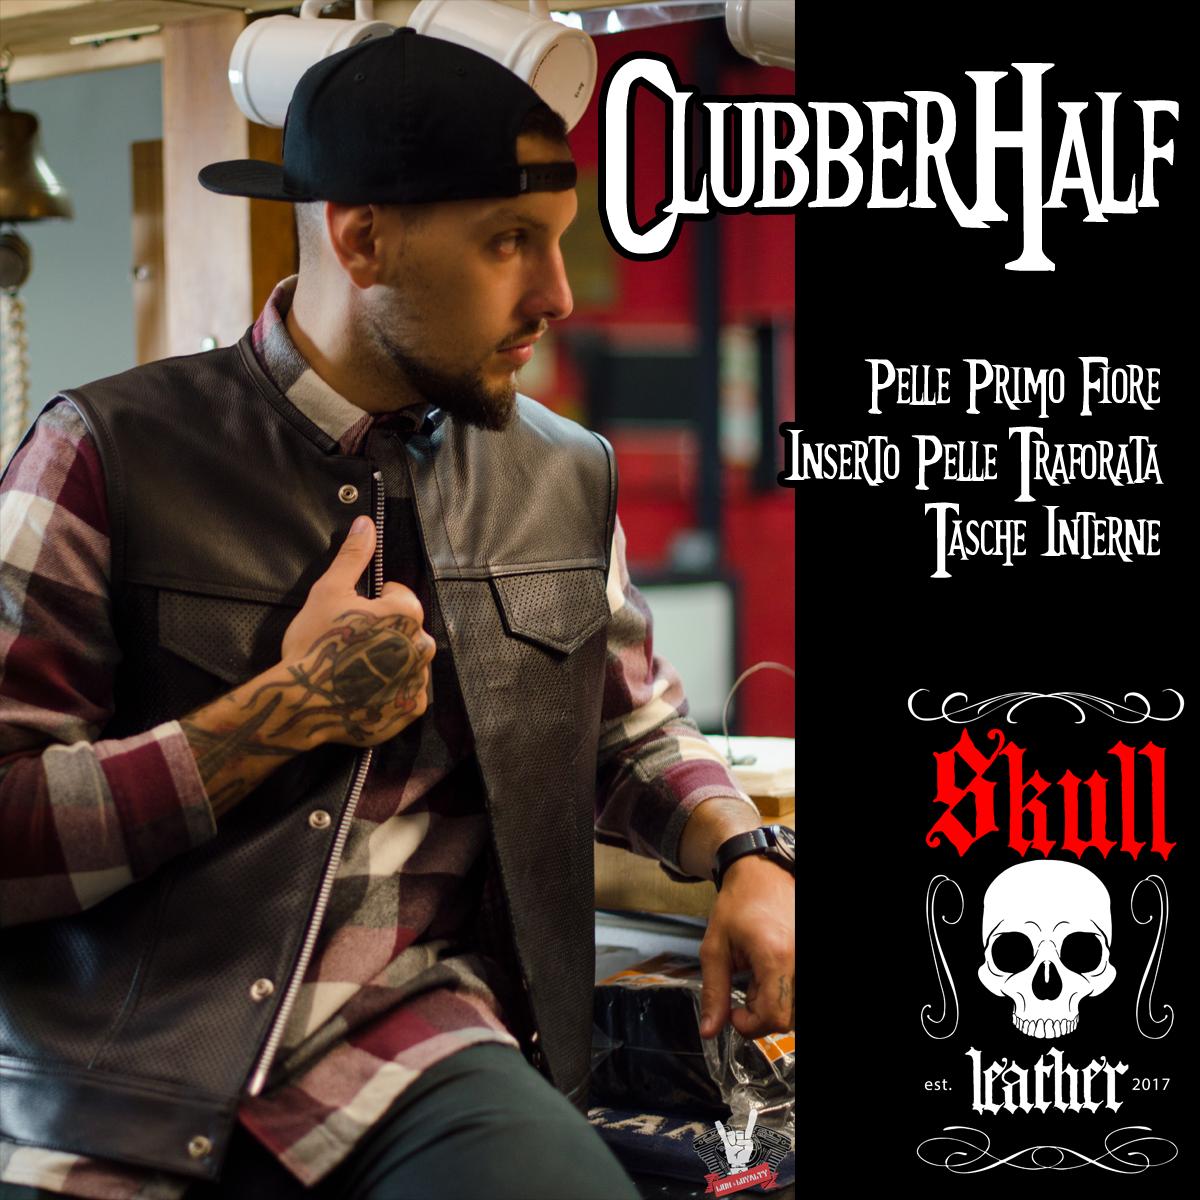 Clubber Half